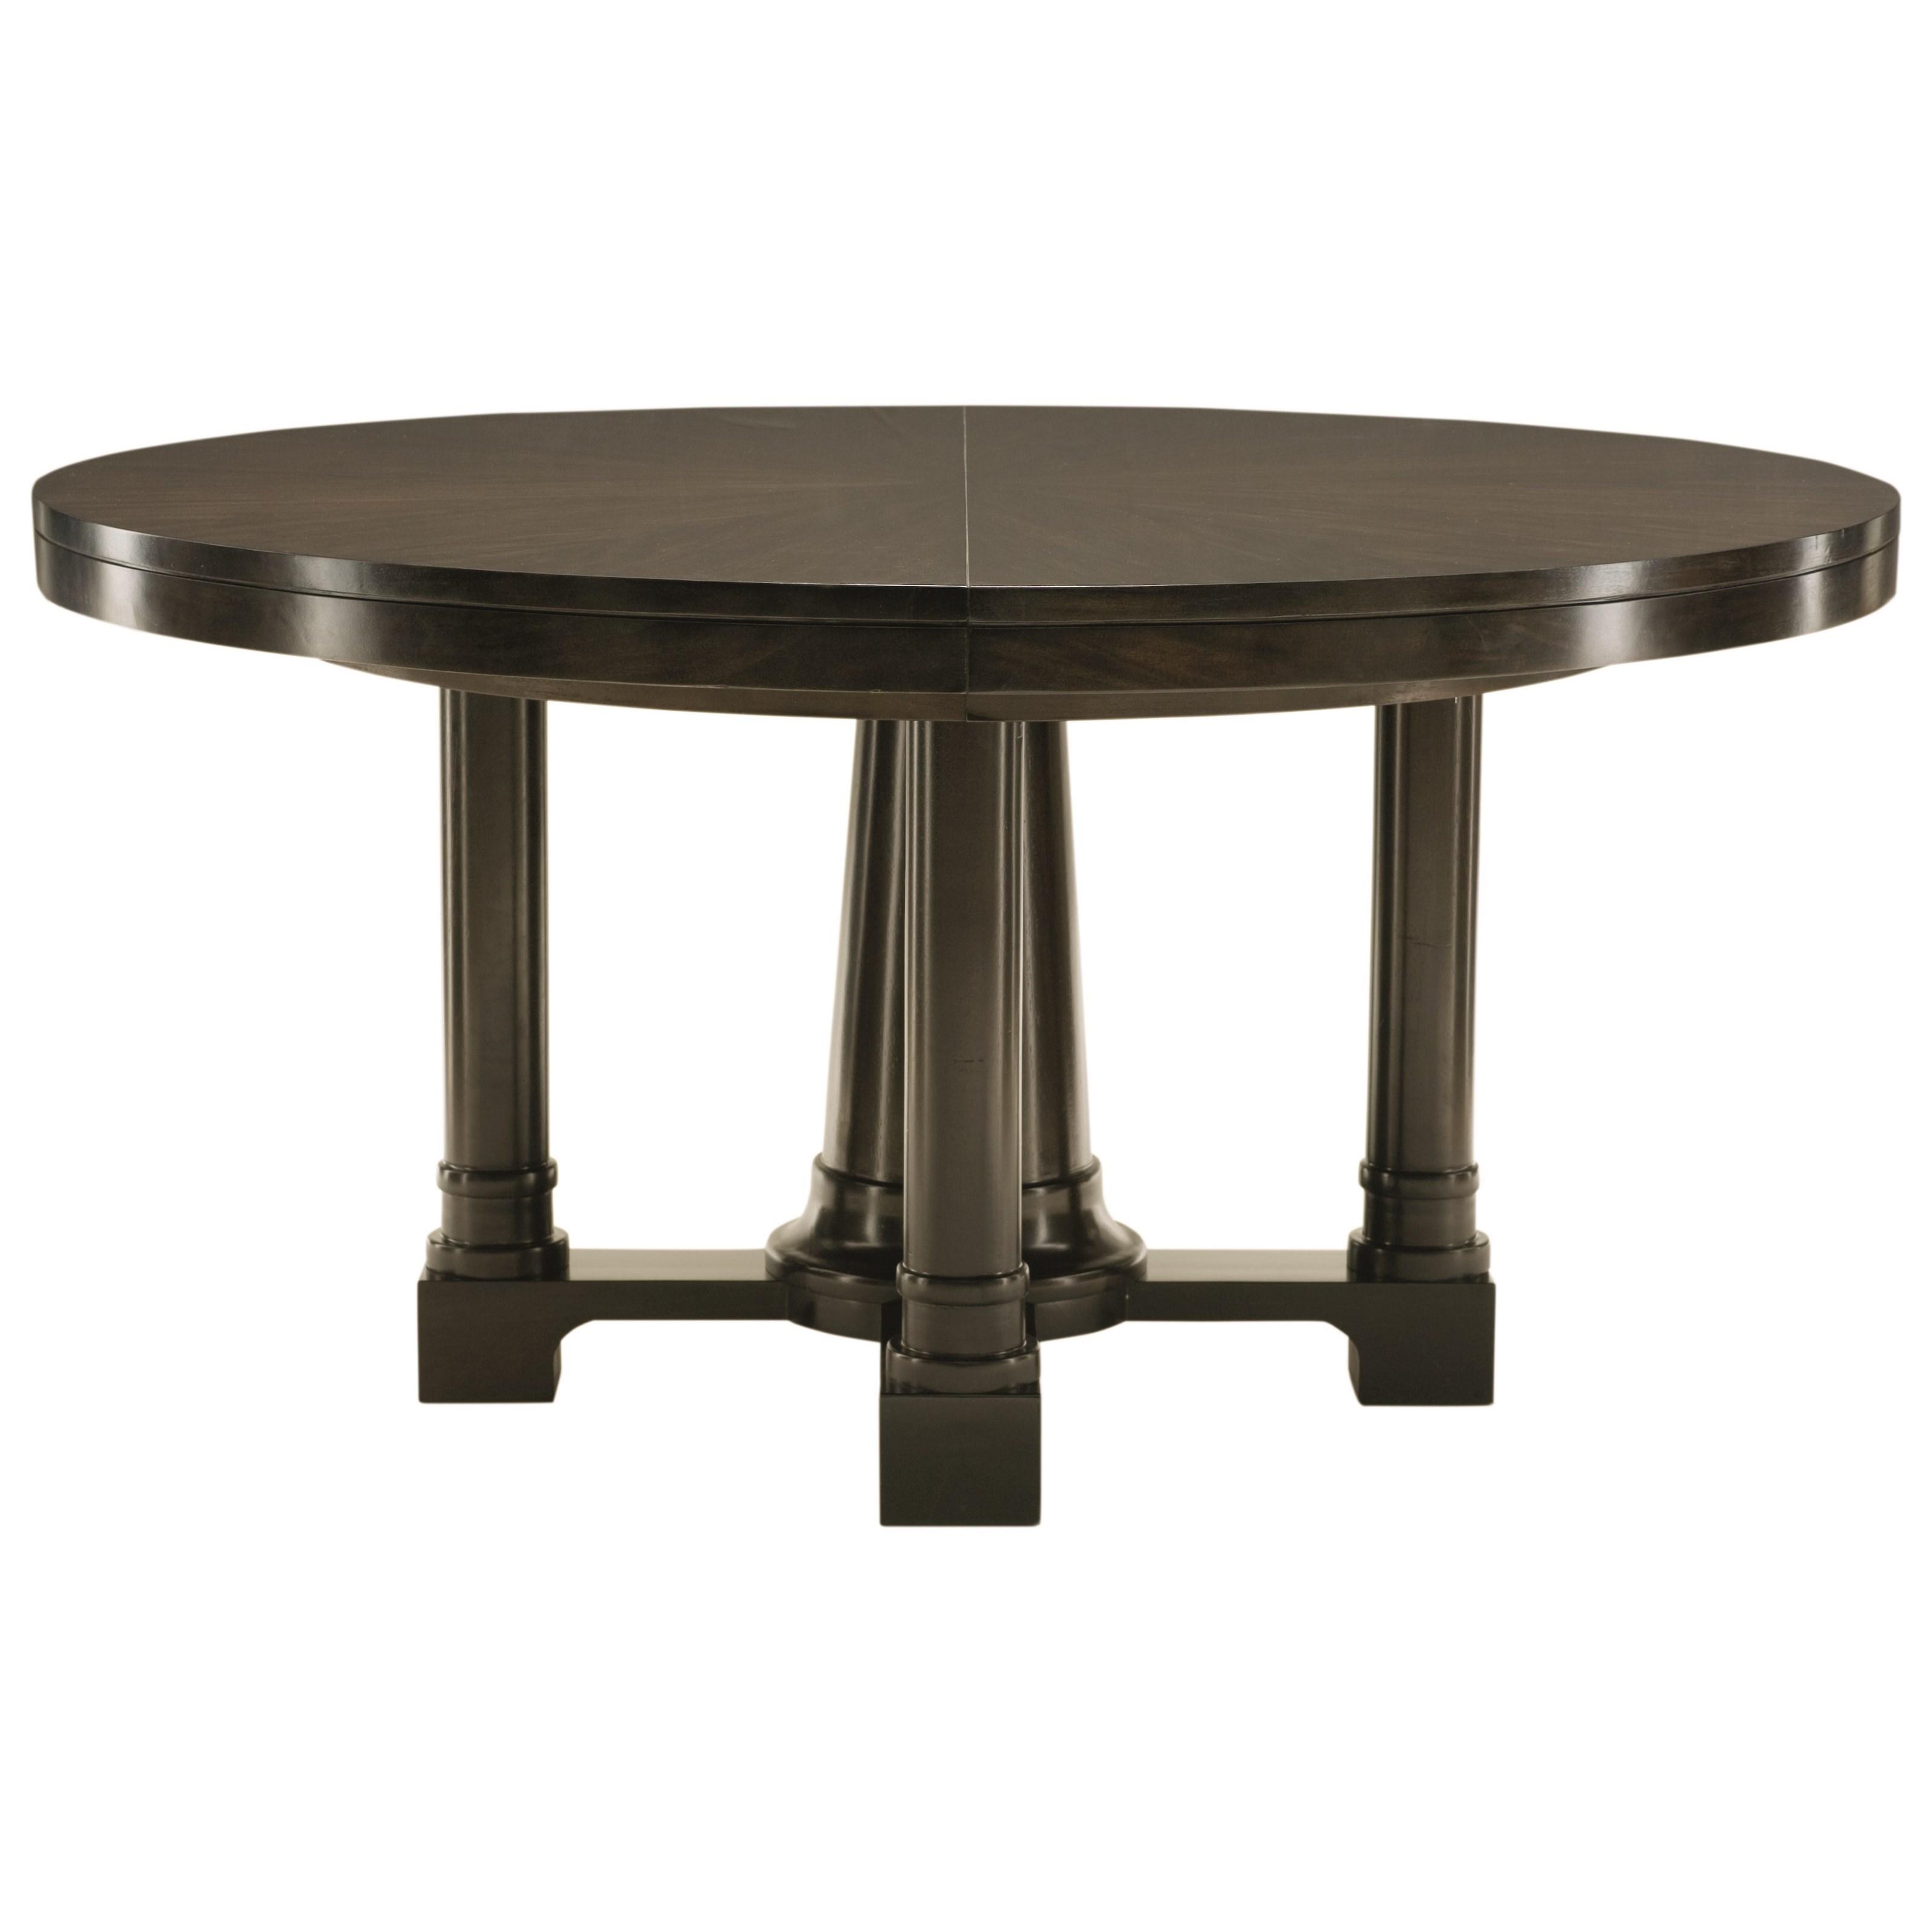 Bernhardt Sutton House Round Pedestal Dining Table With 20